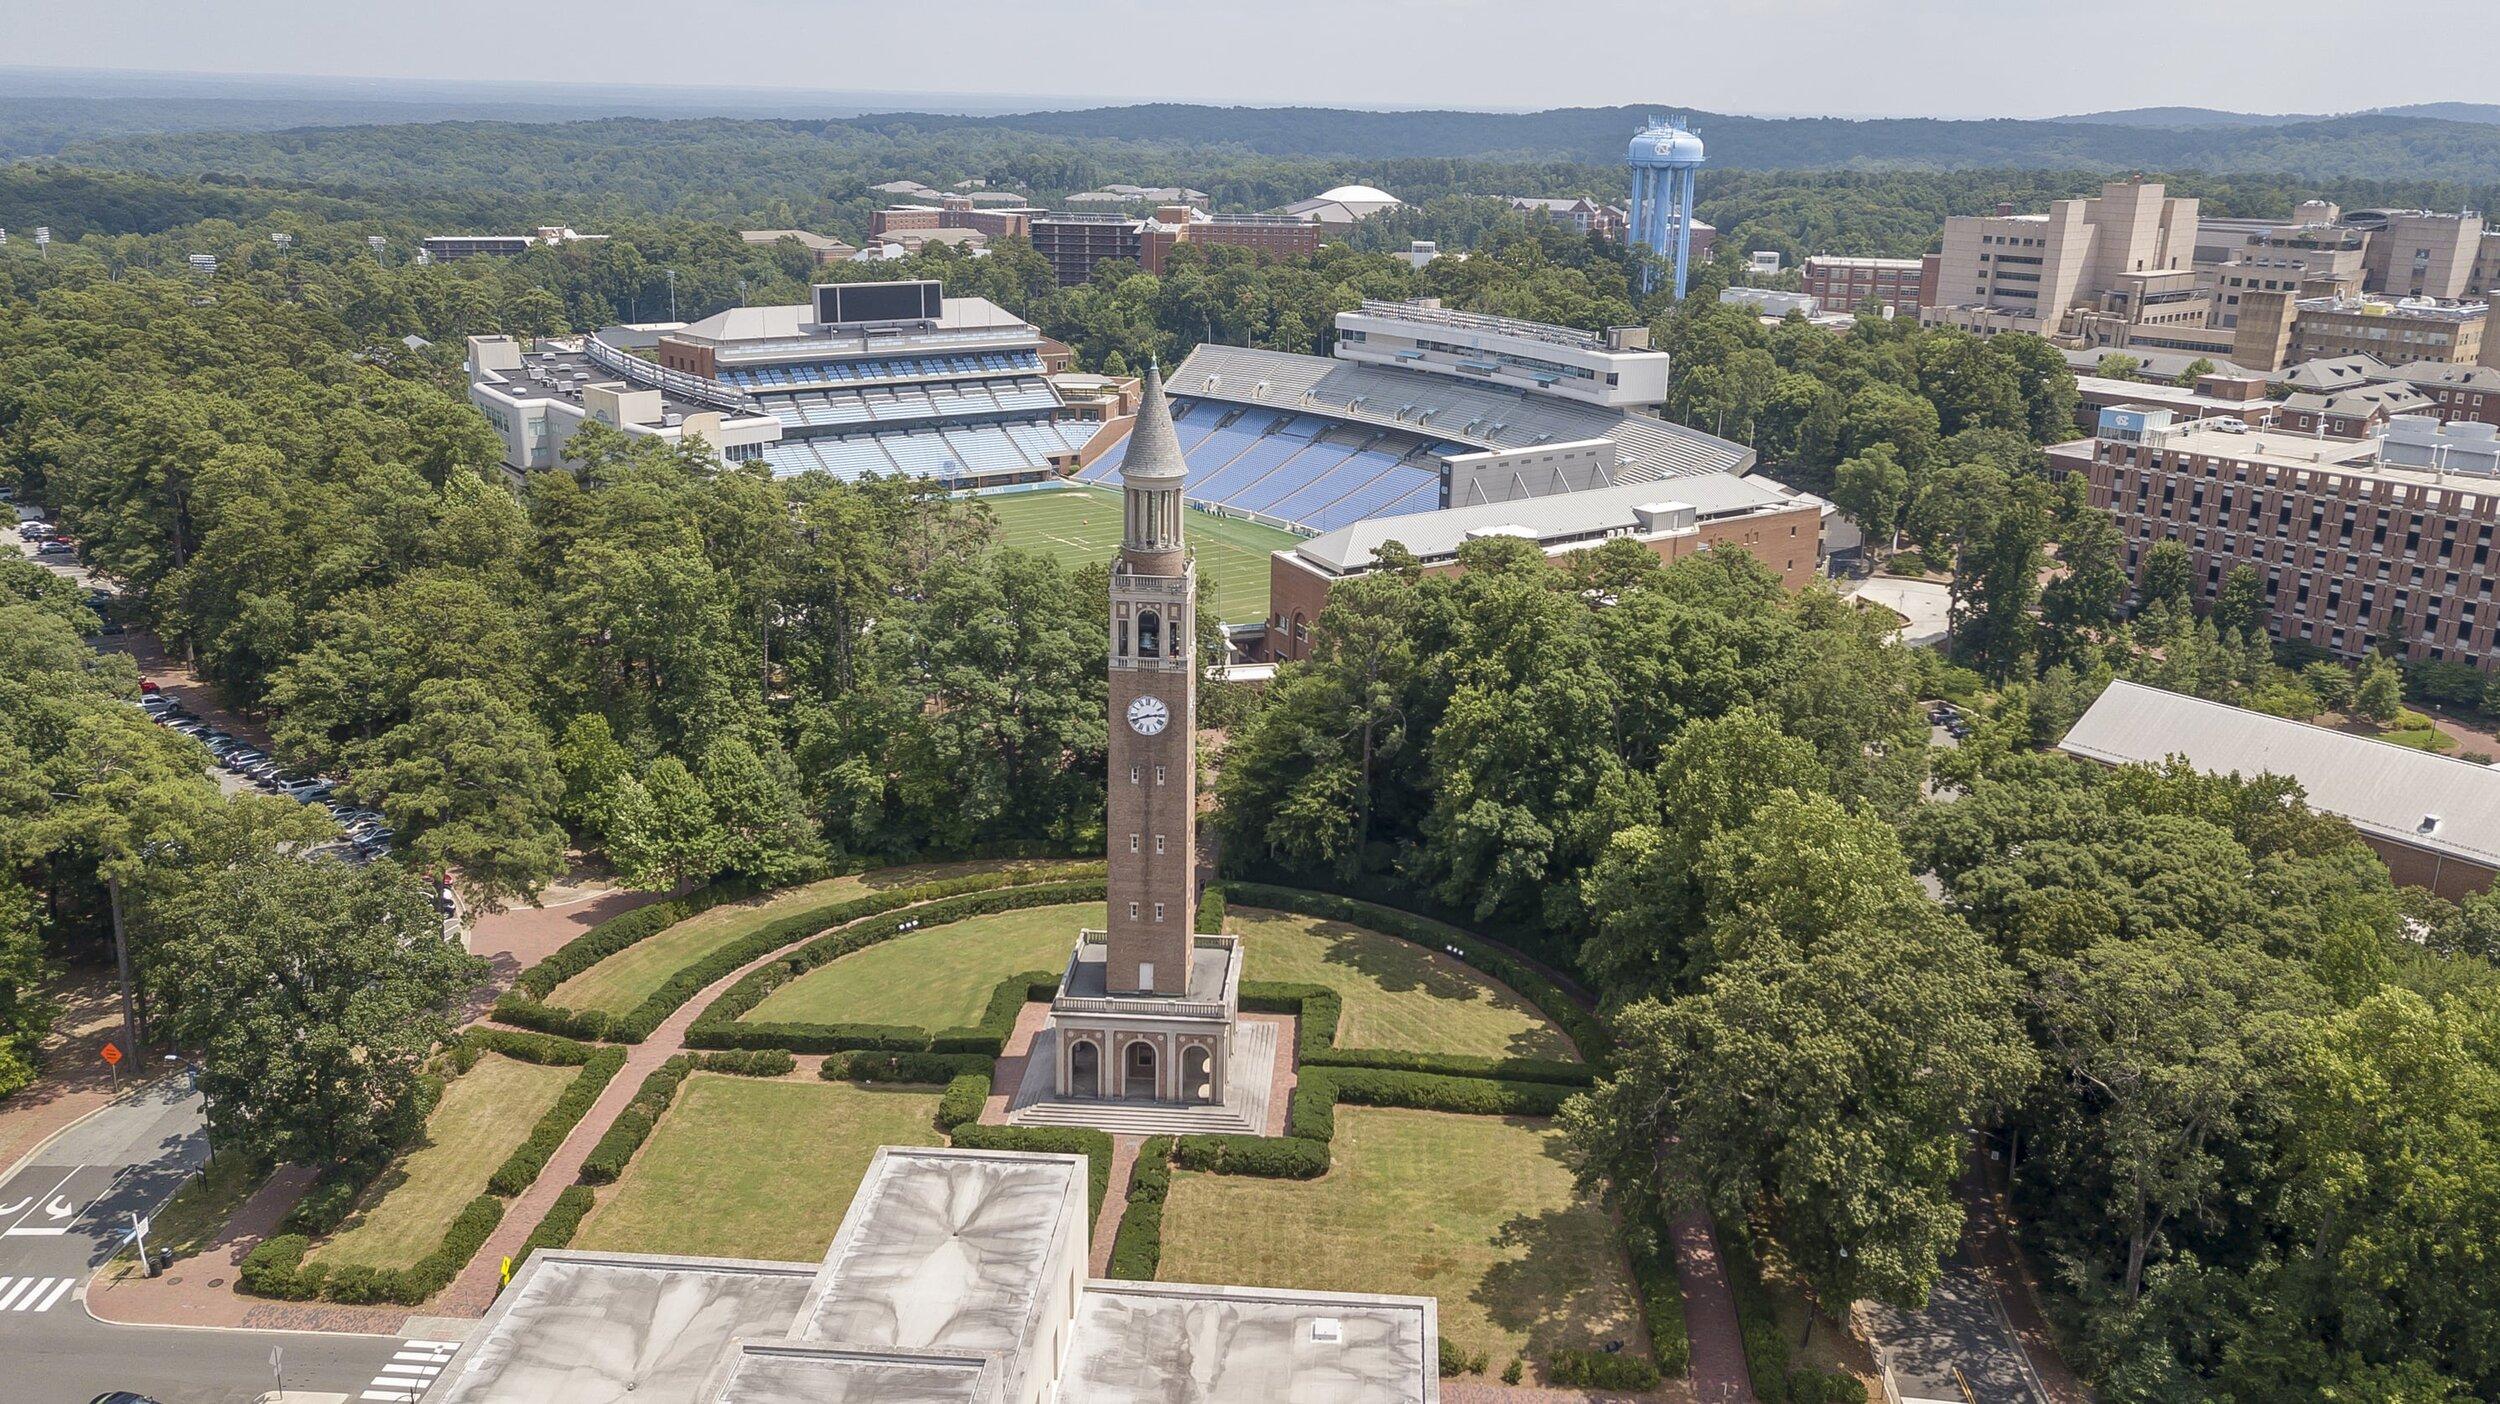 Overhead view of Chapel Hill, North Carolina